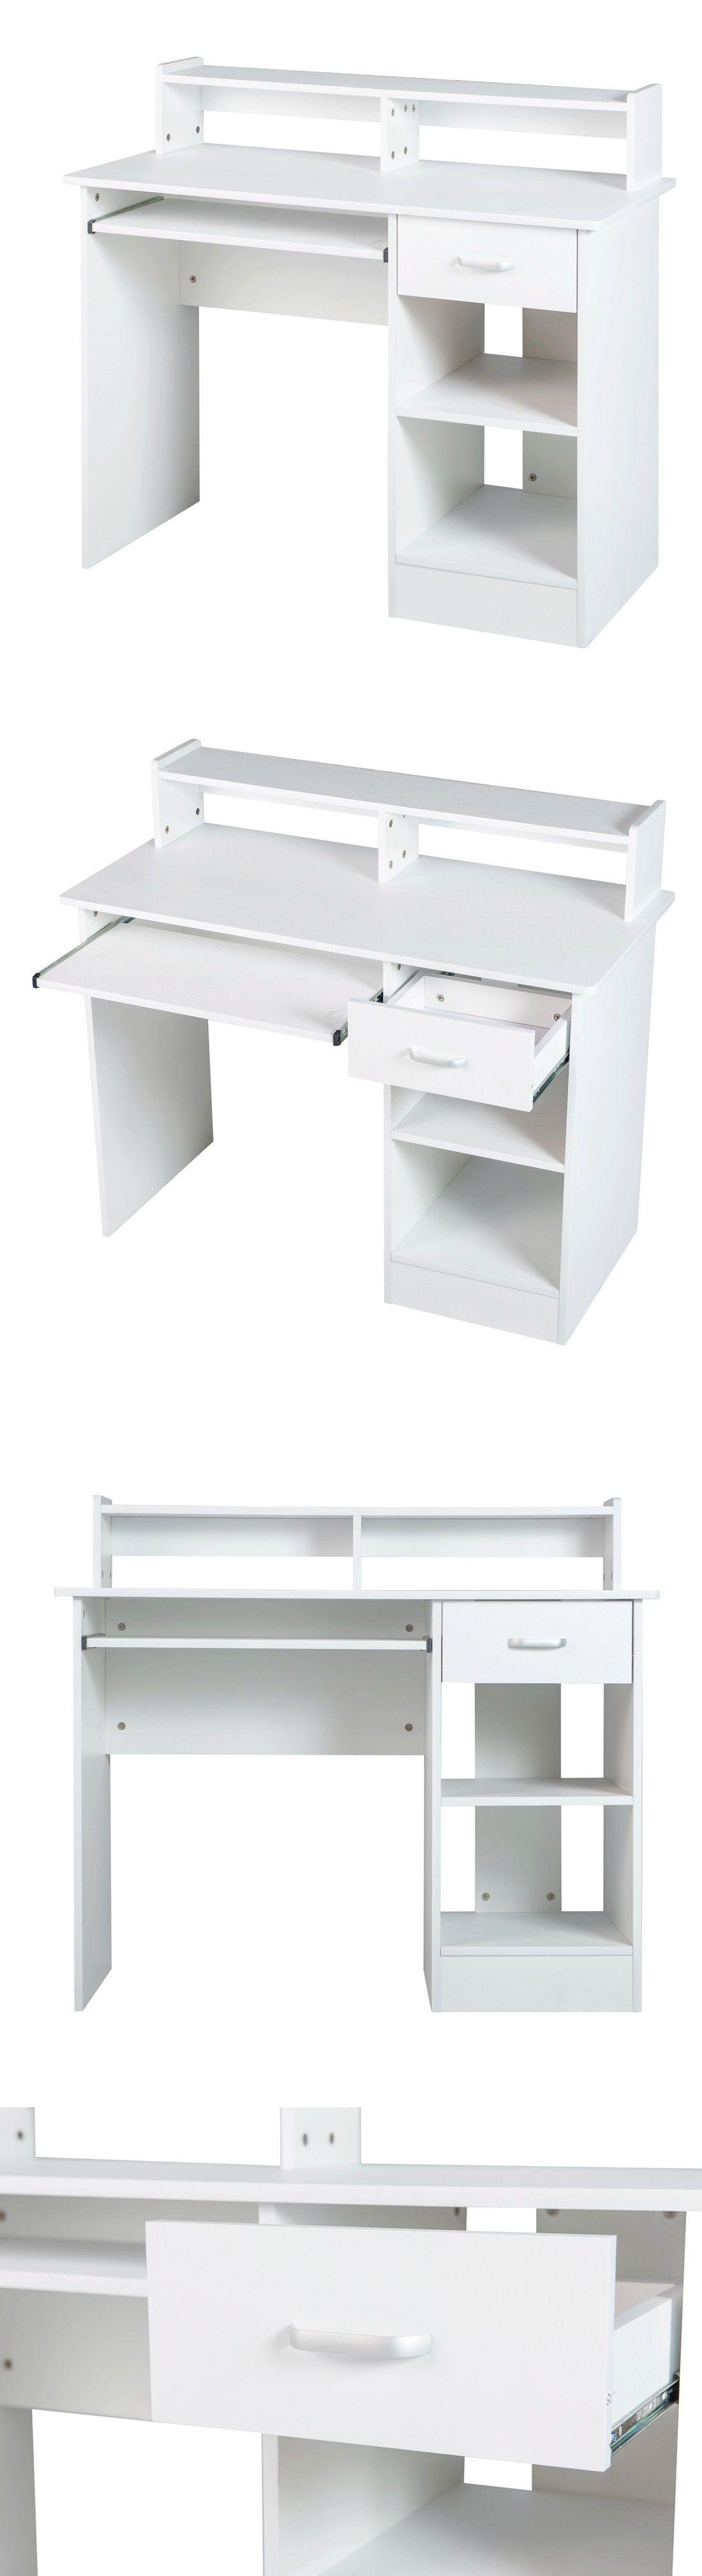 Desks and Home Office Furniture 88057: White Computer Desk ...